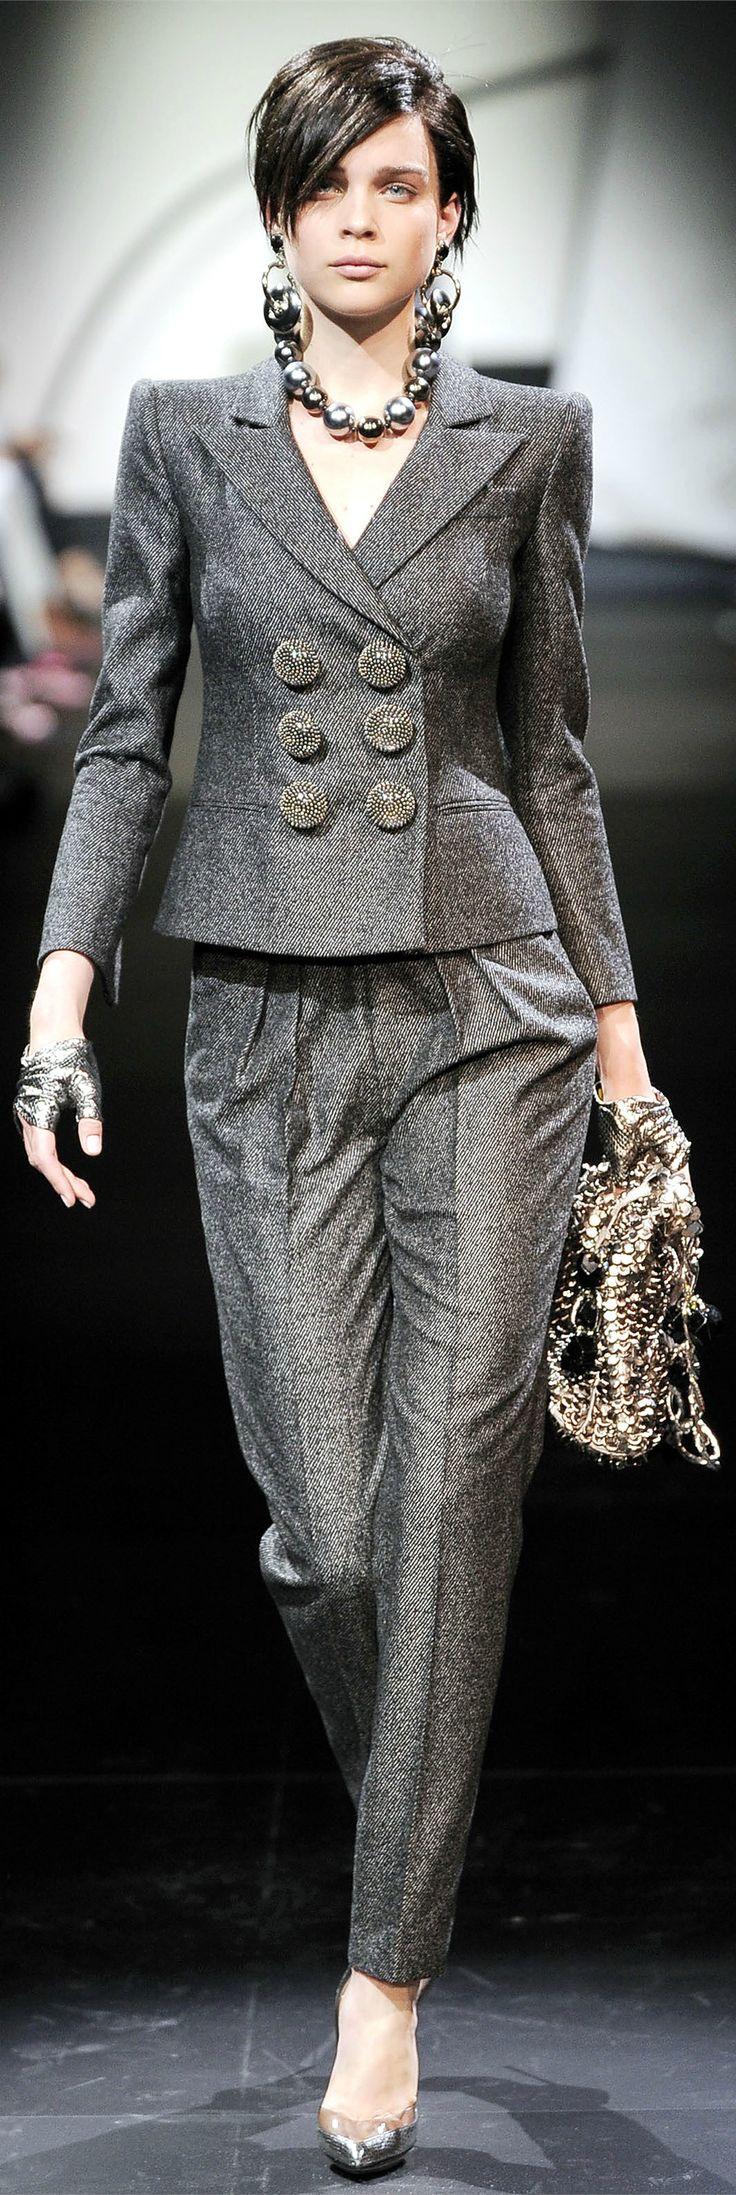 Armani Privé Haute Couture Spring Summer 2010 collection